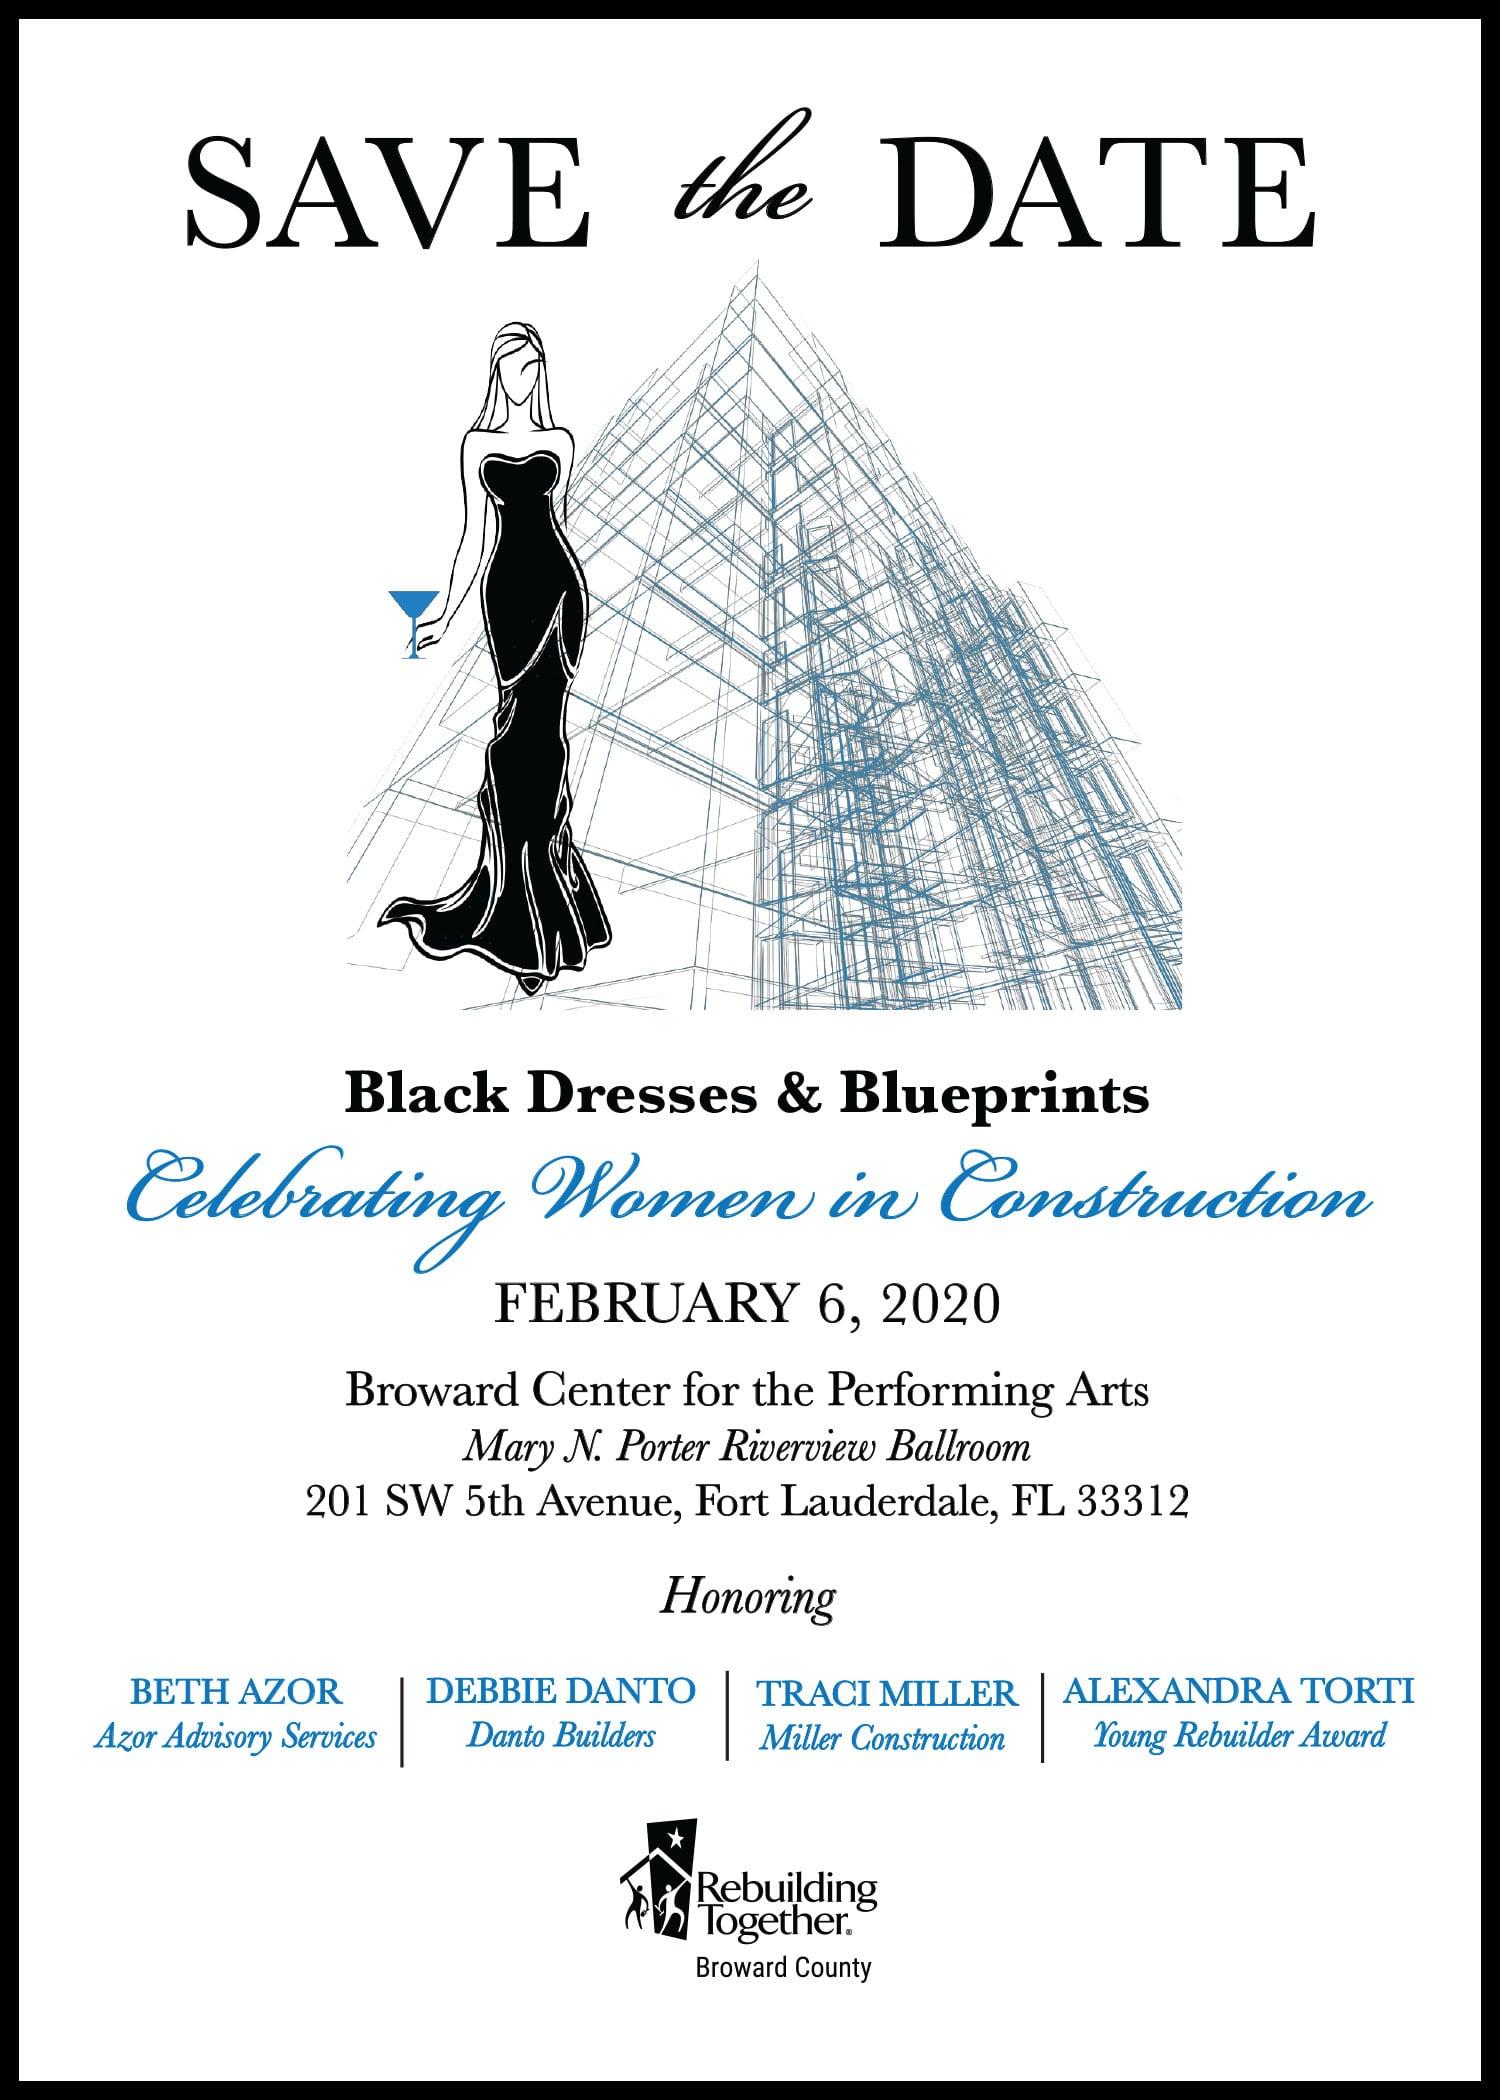 Black Dresses and Blueprints